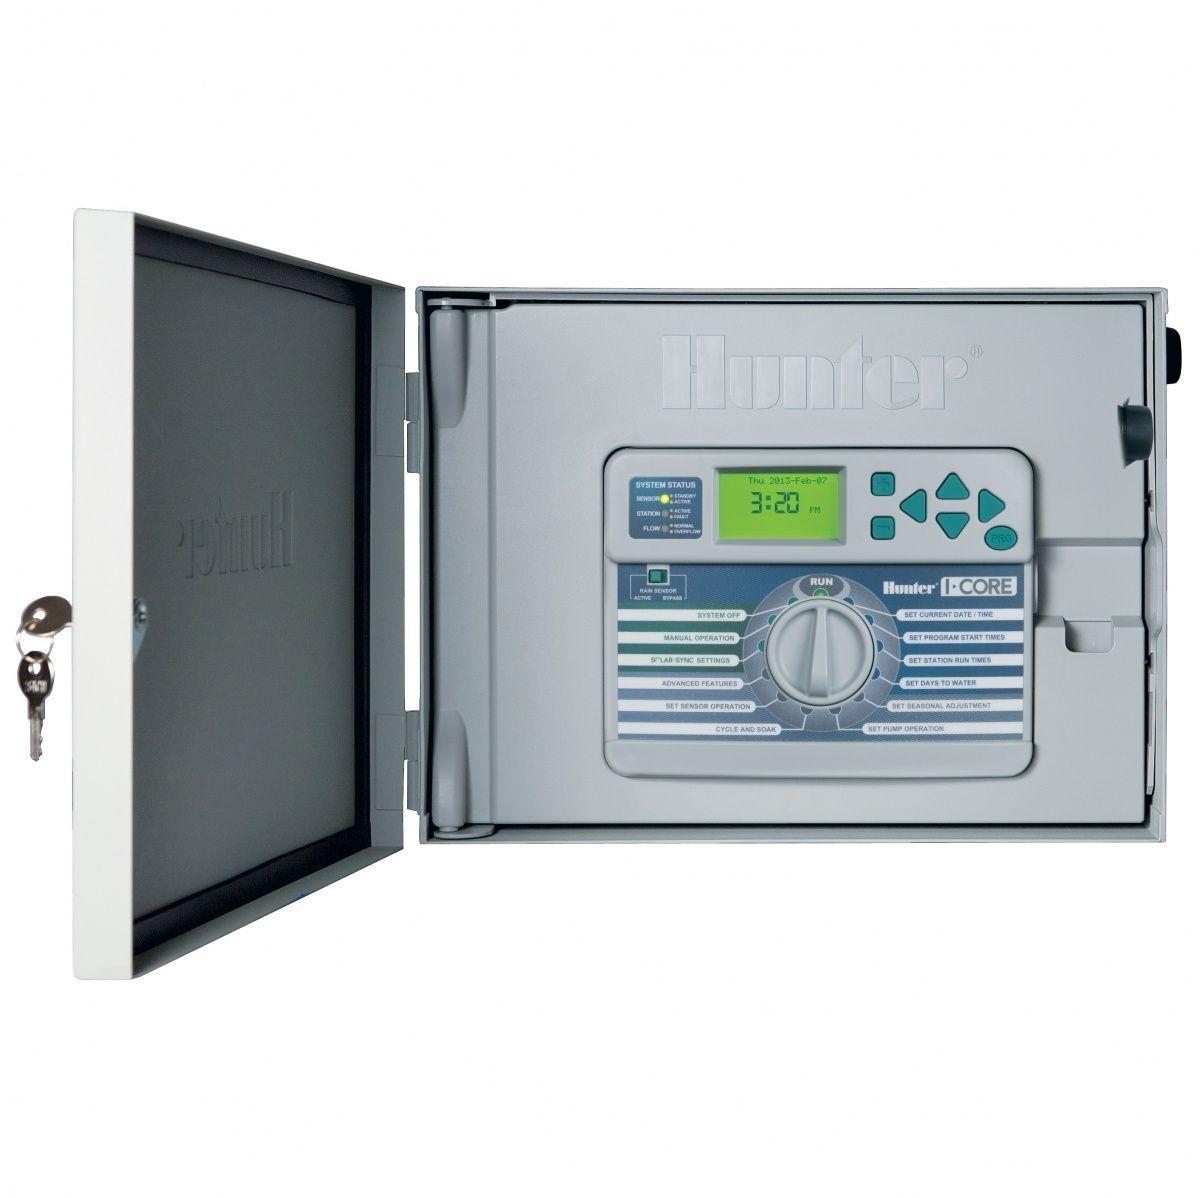 Hunter IC-600-SS = 6-станционный модульный контроллер полива серии I-CORE